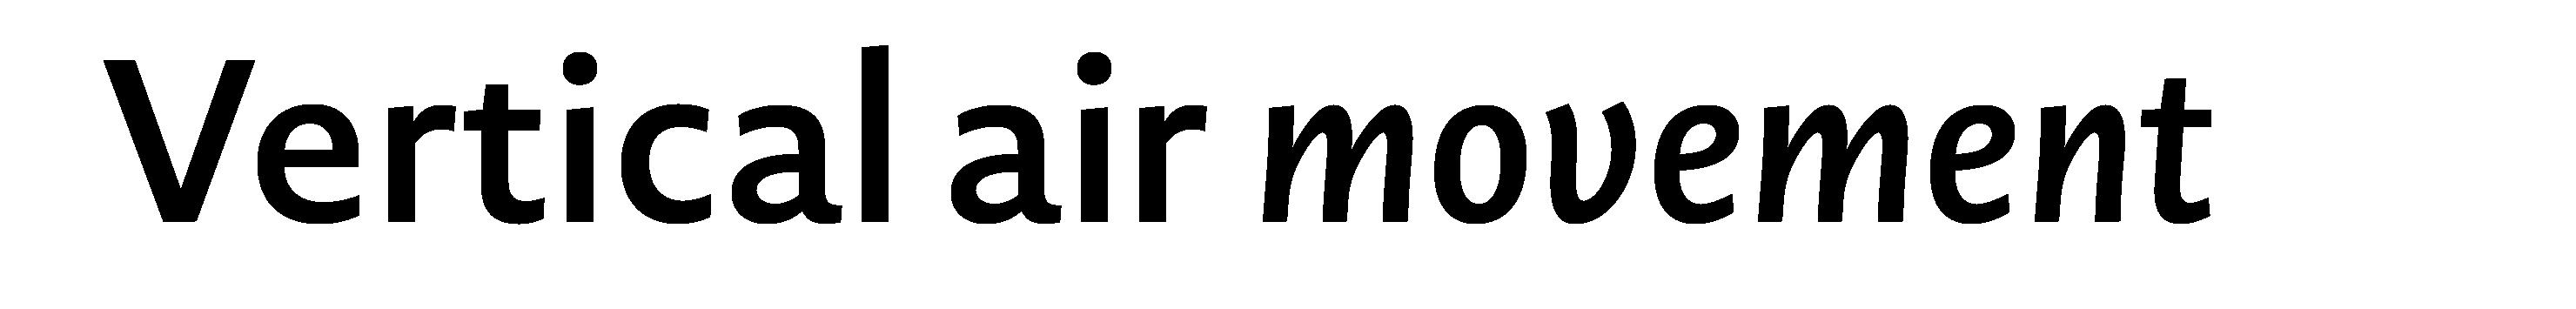 Typeface Novel Sans D04 Atlas Font Foundry